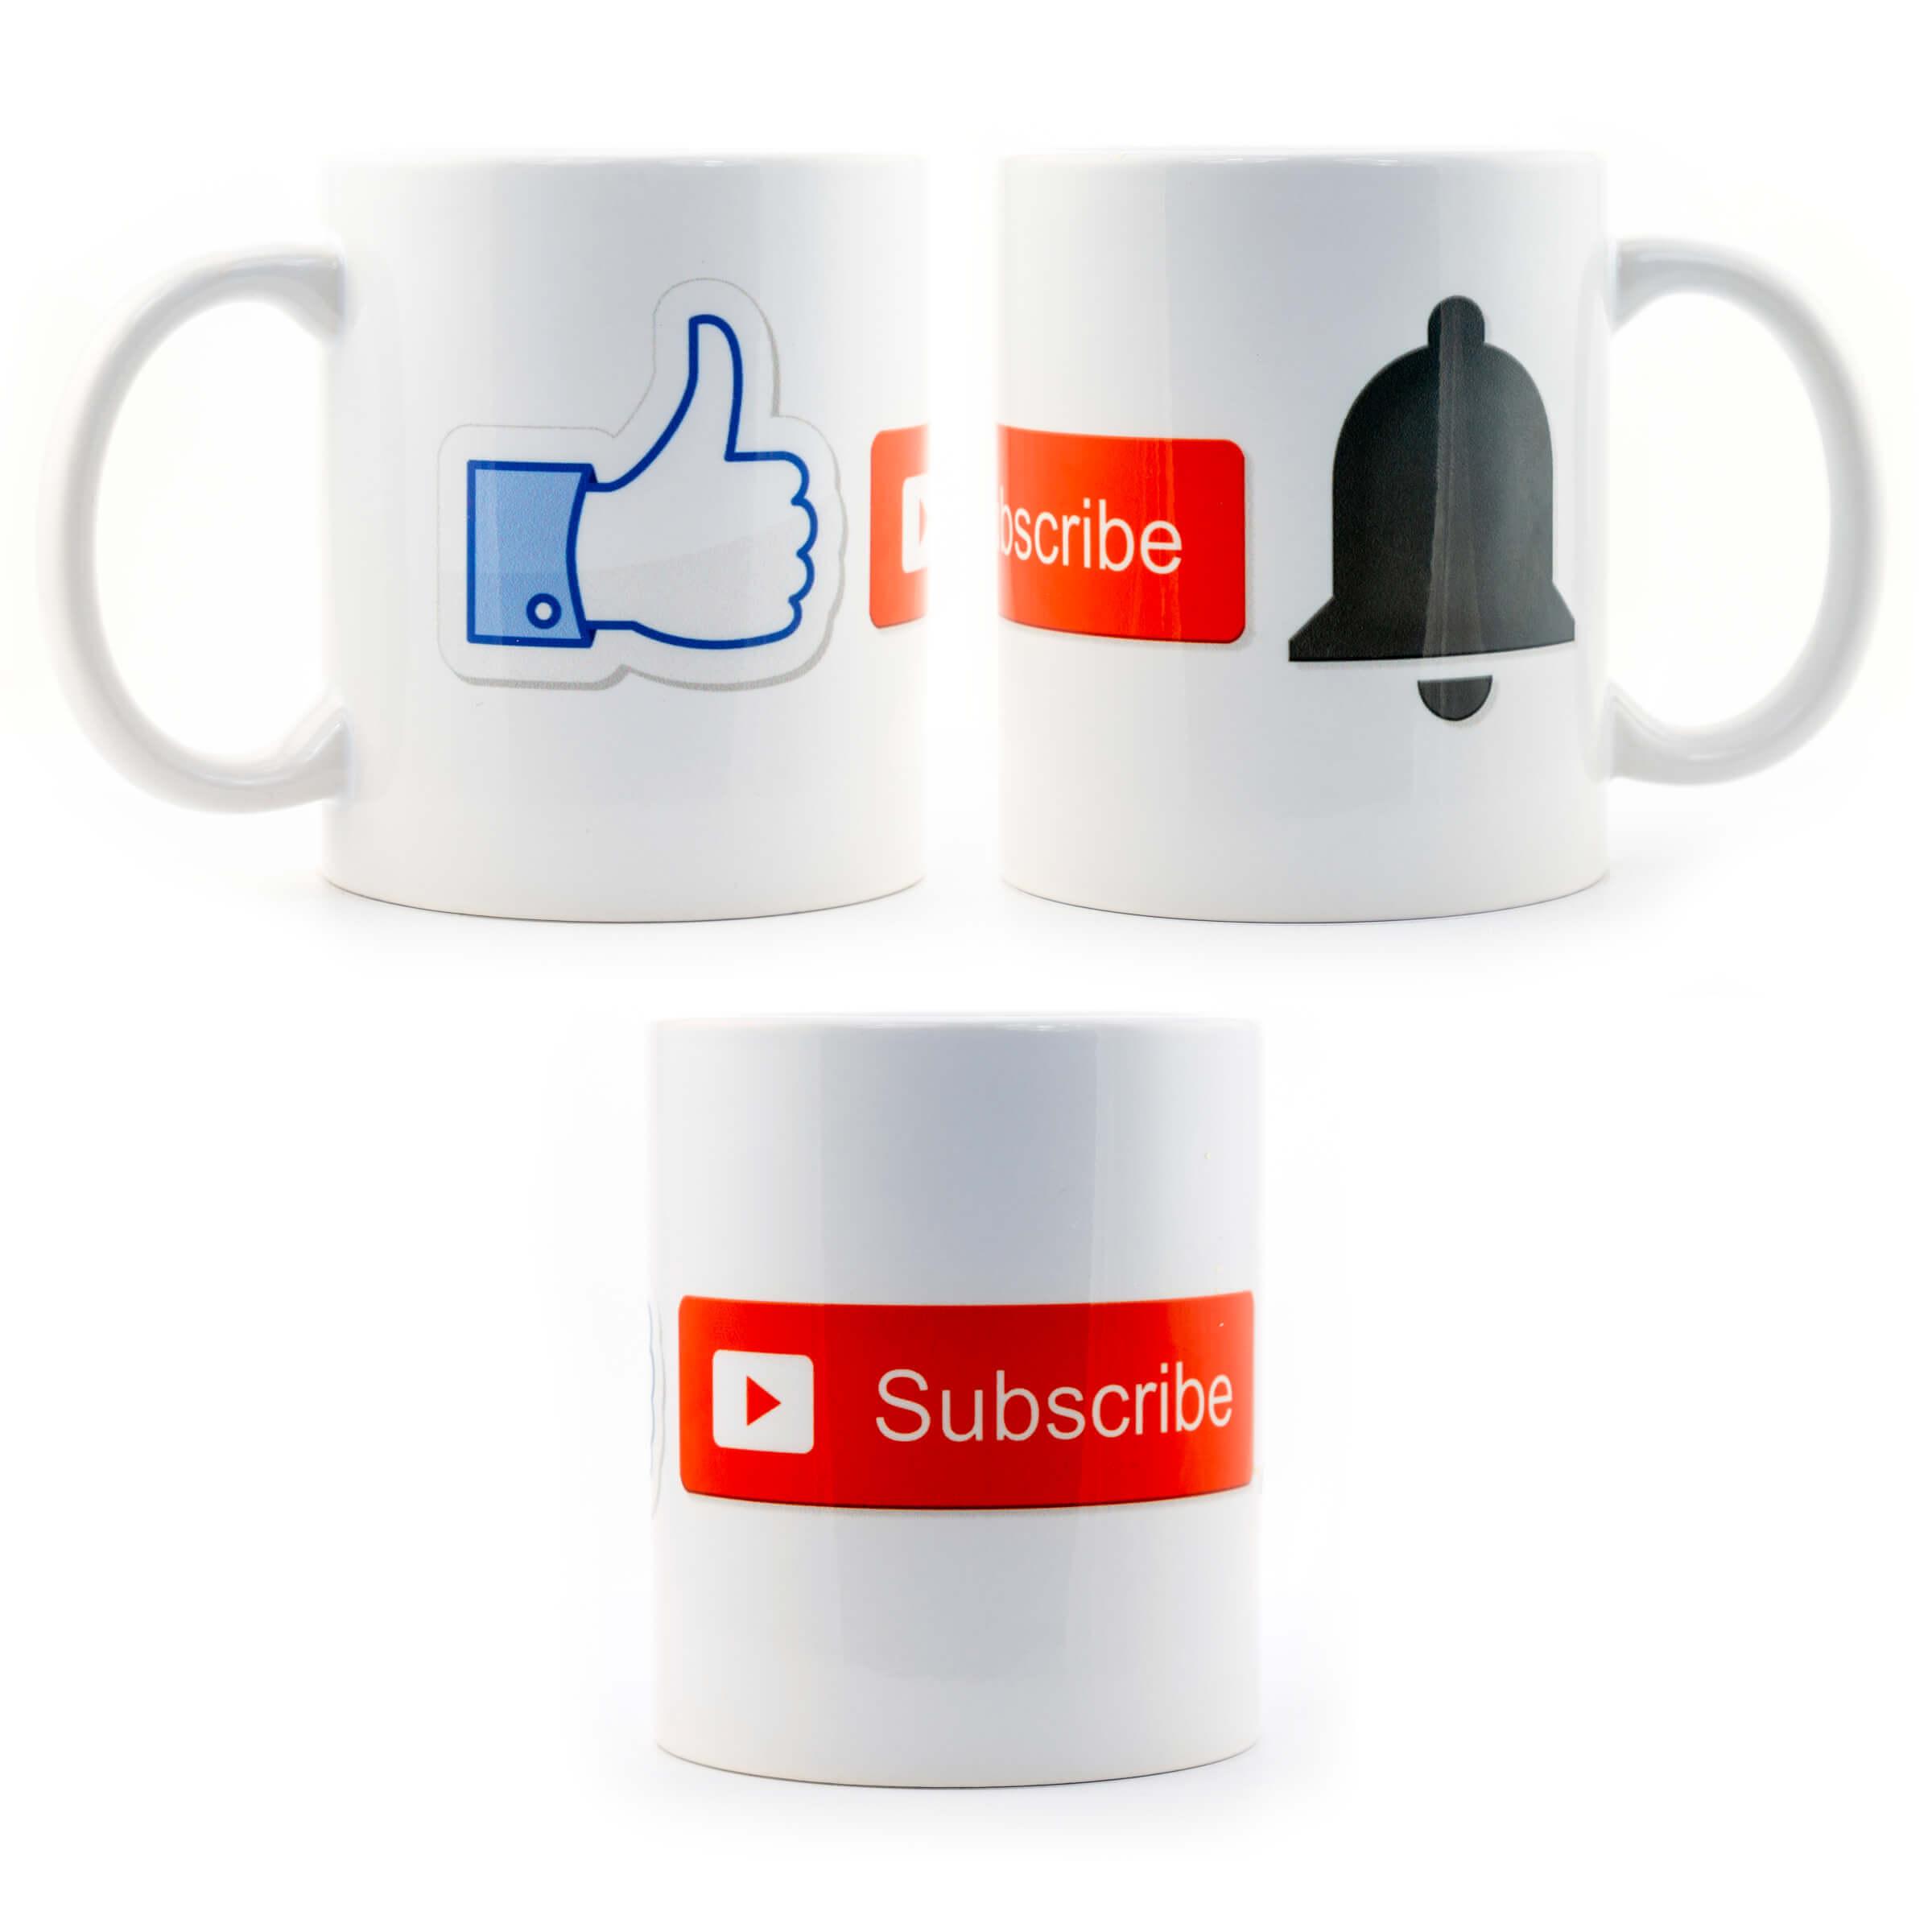 Like, Subscribe, Notify Mug